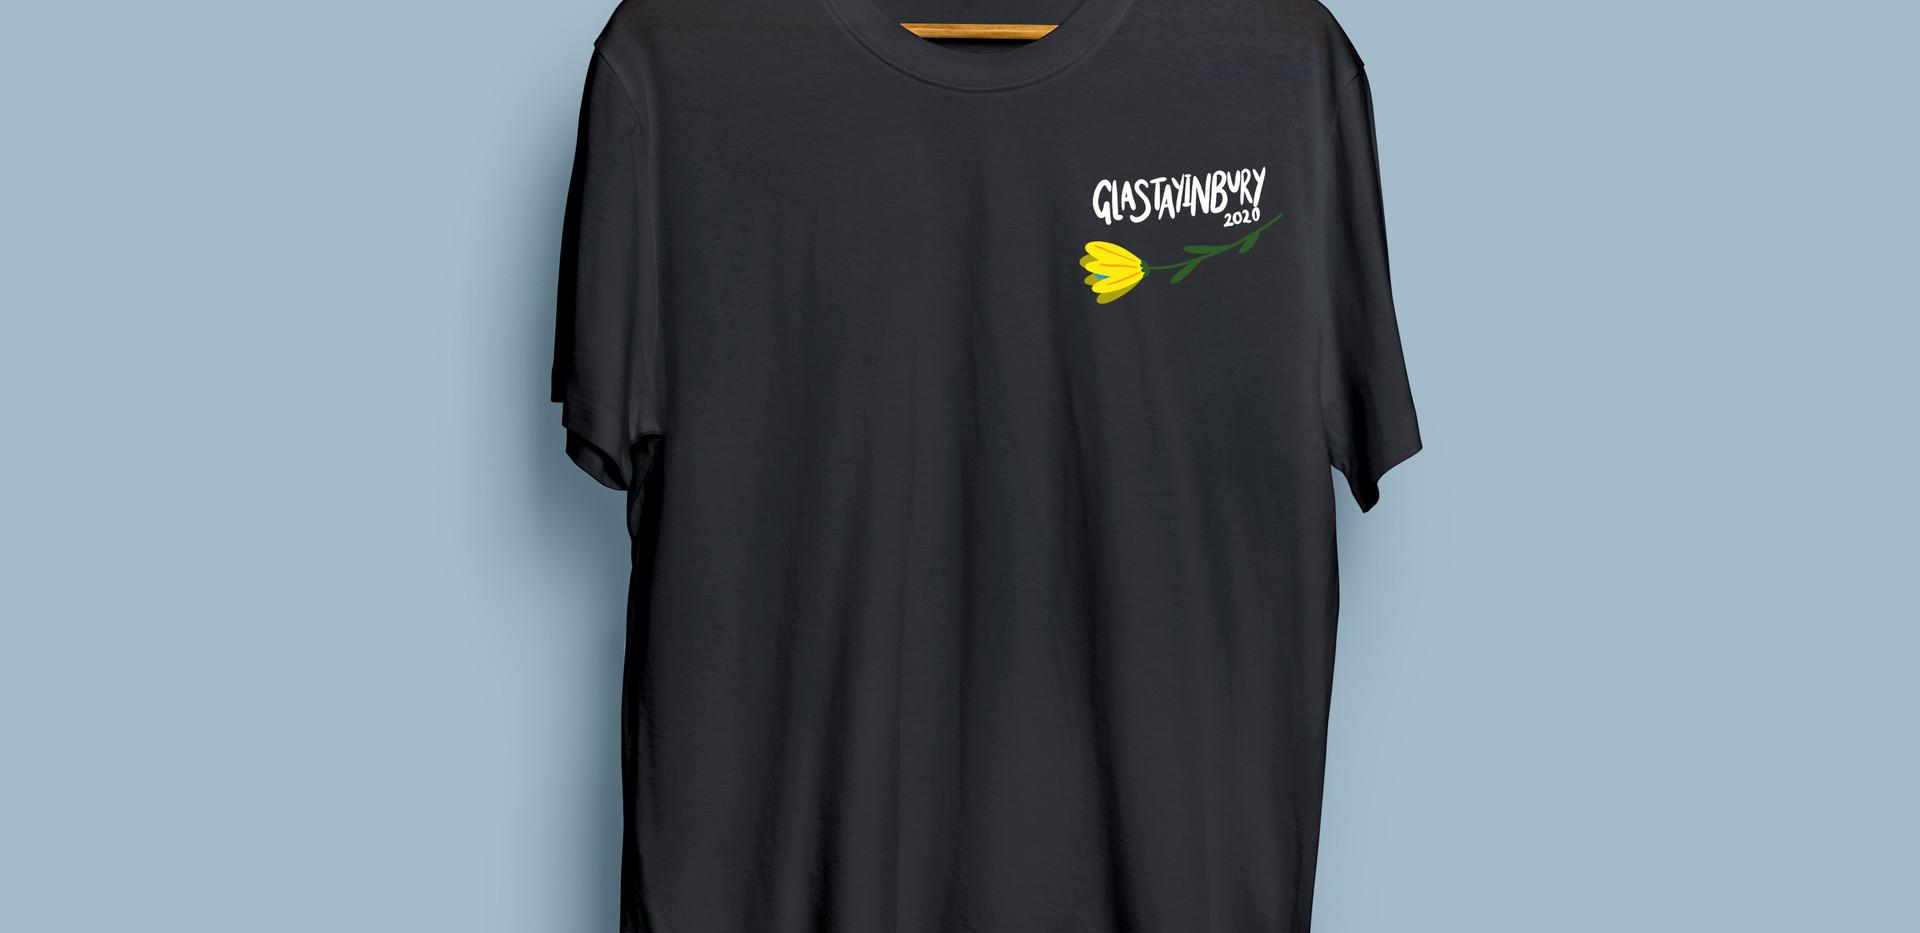 Glastayinbury Grey Flower T-Shirt